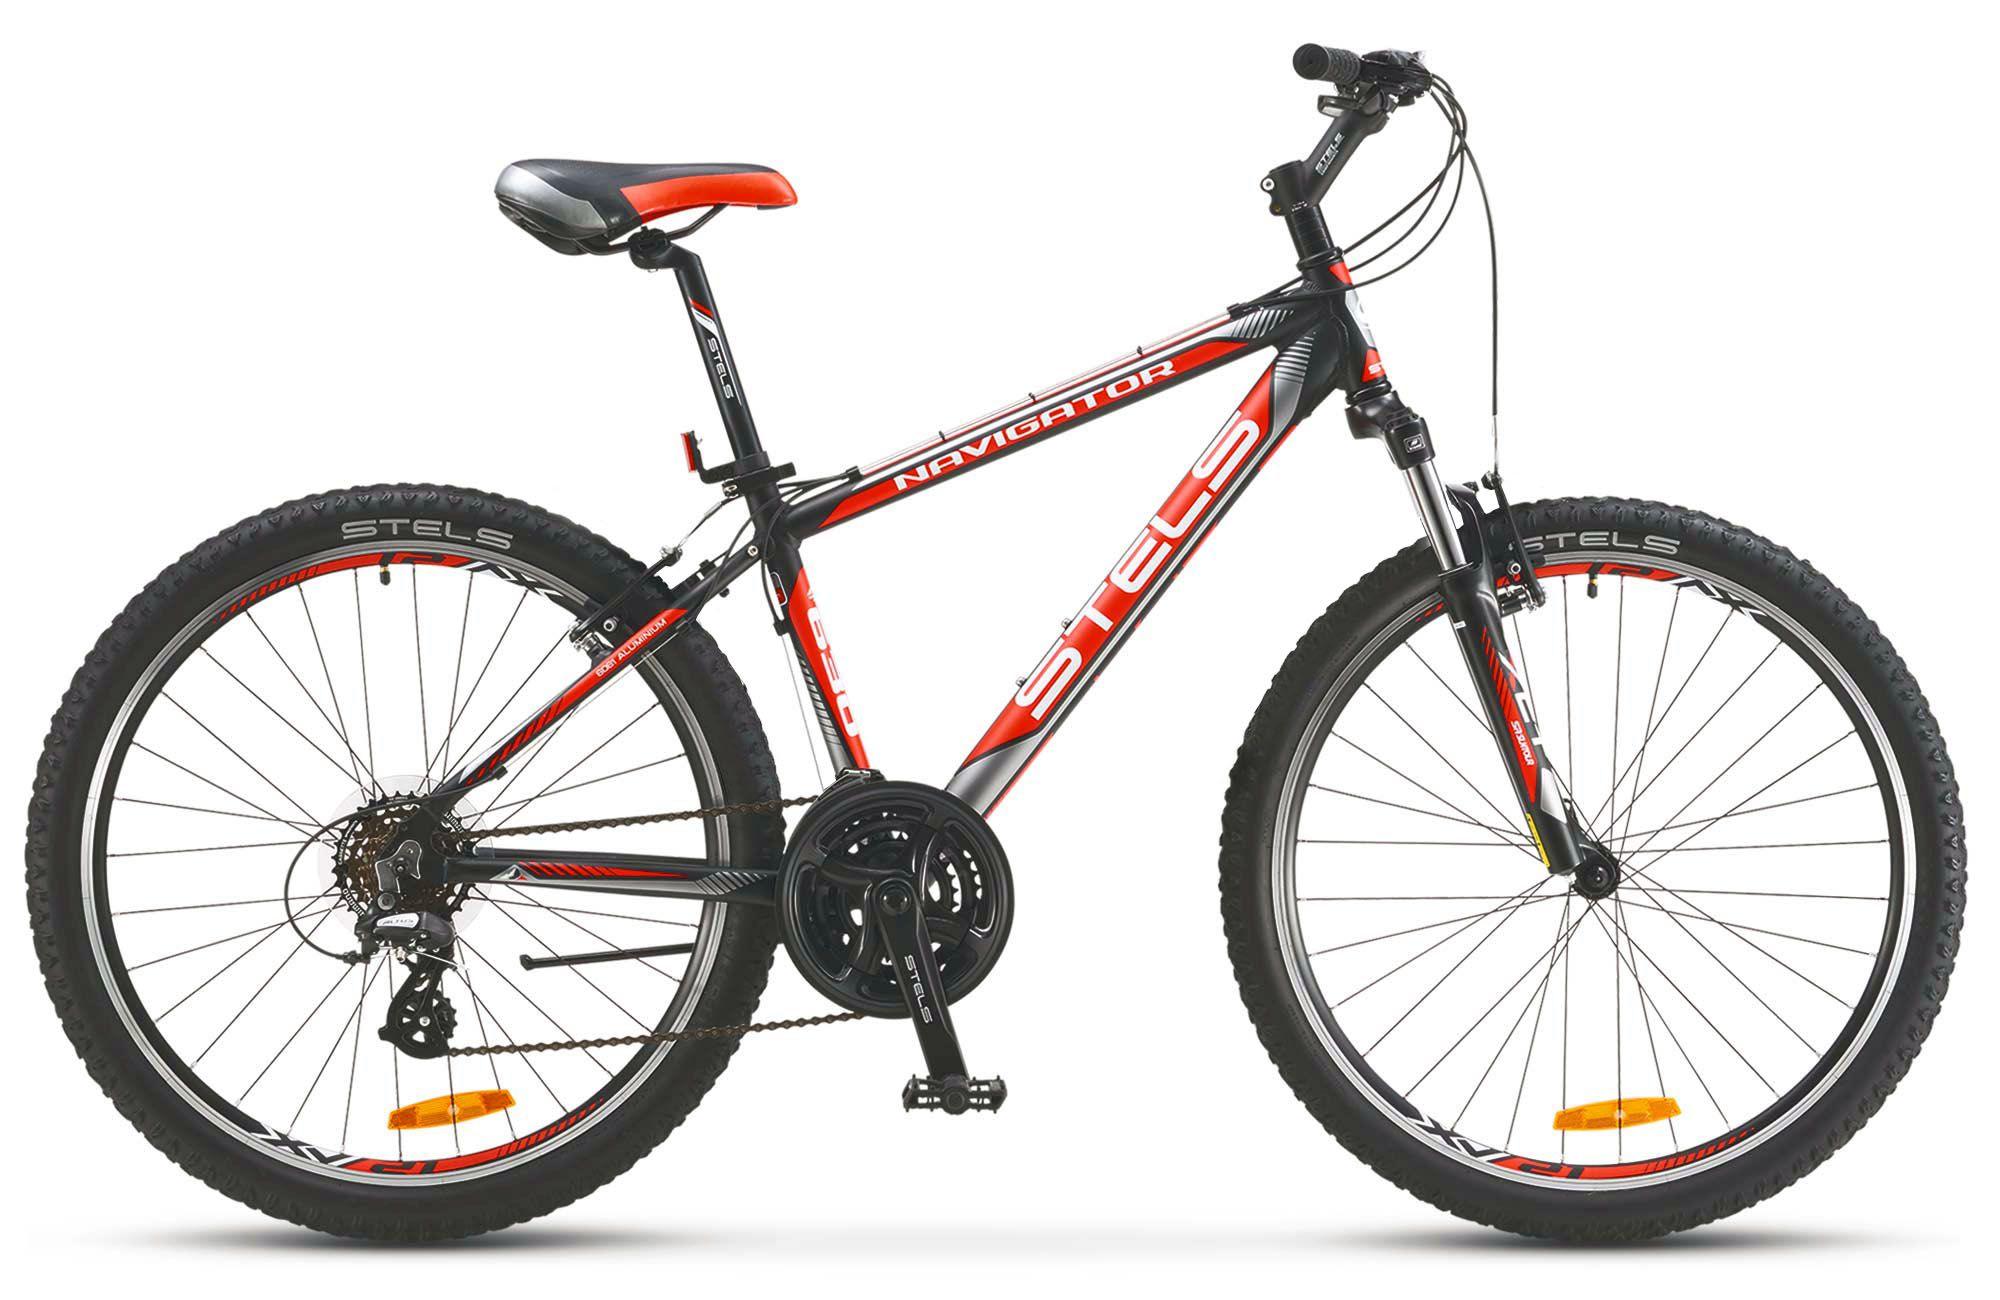 Велосипед Stels Navigator 630 V 26 (V010) 2018 велосипед stels crosswind 26 21 sp z010 2018